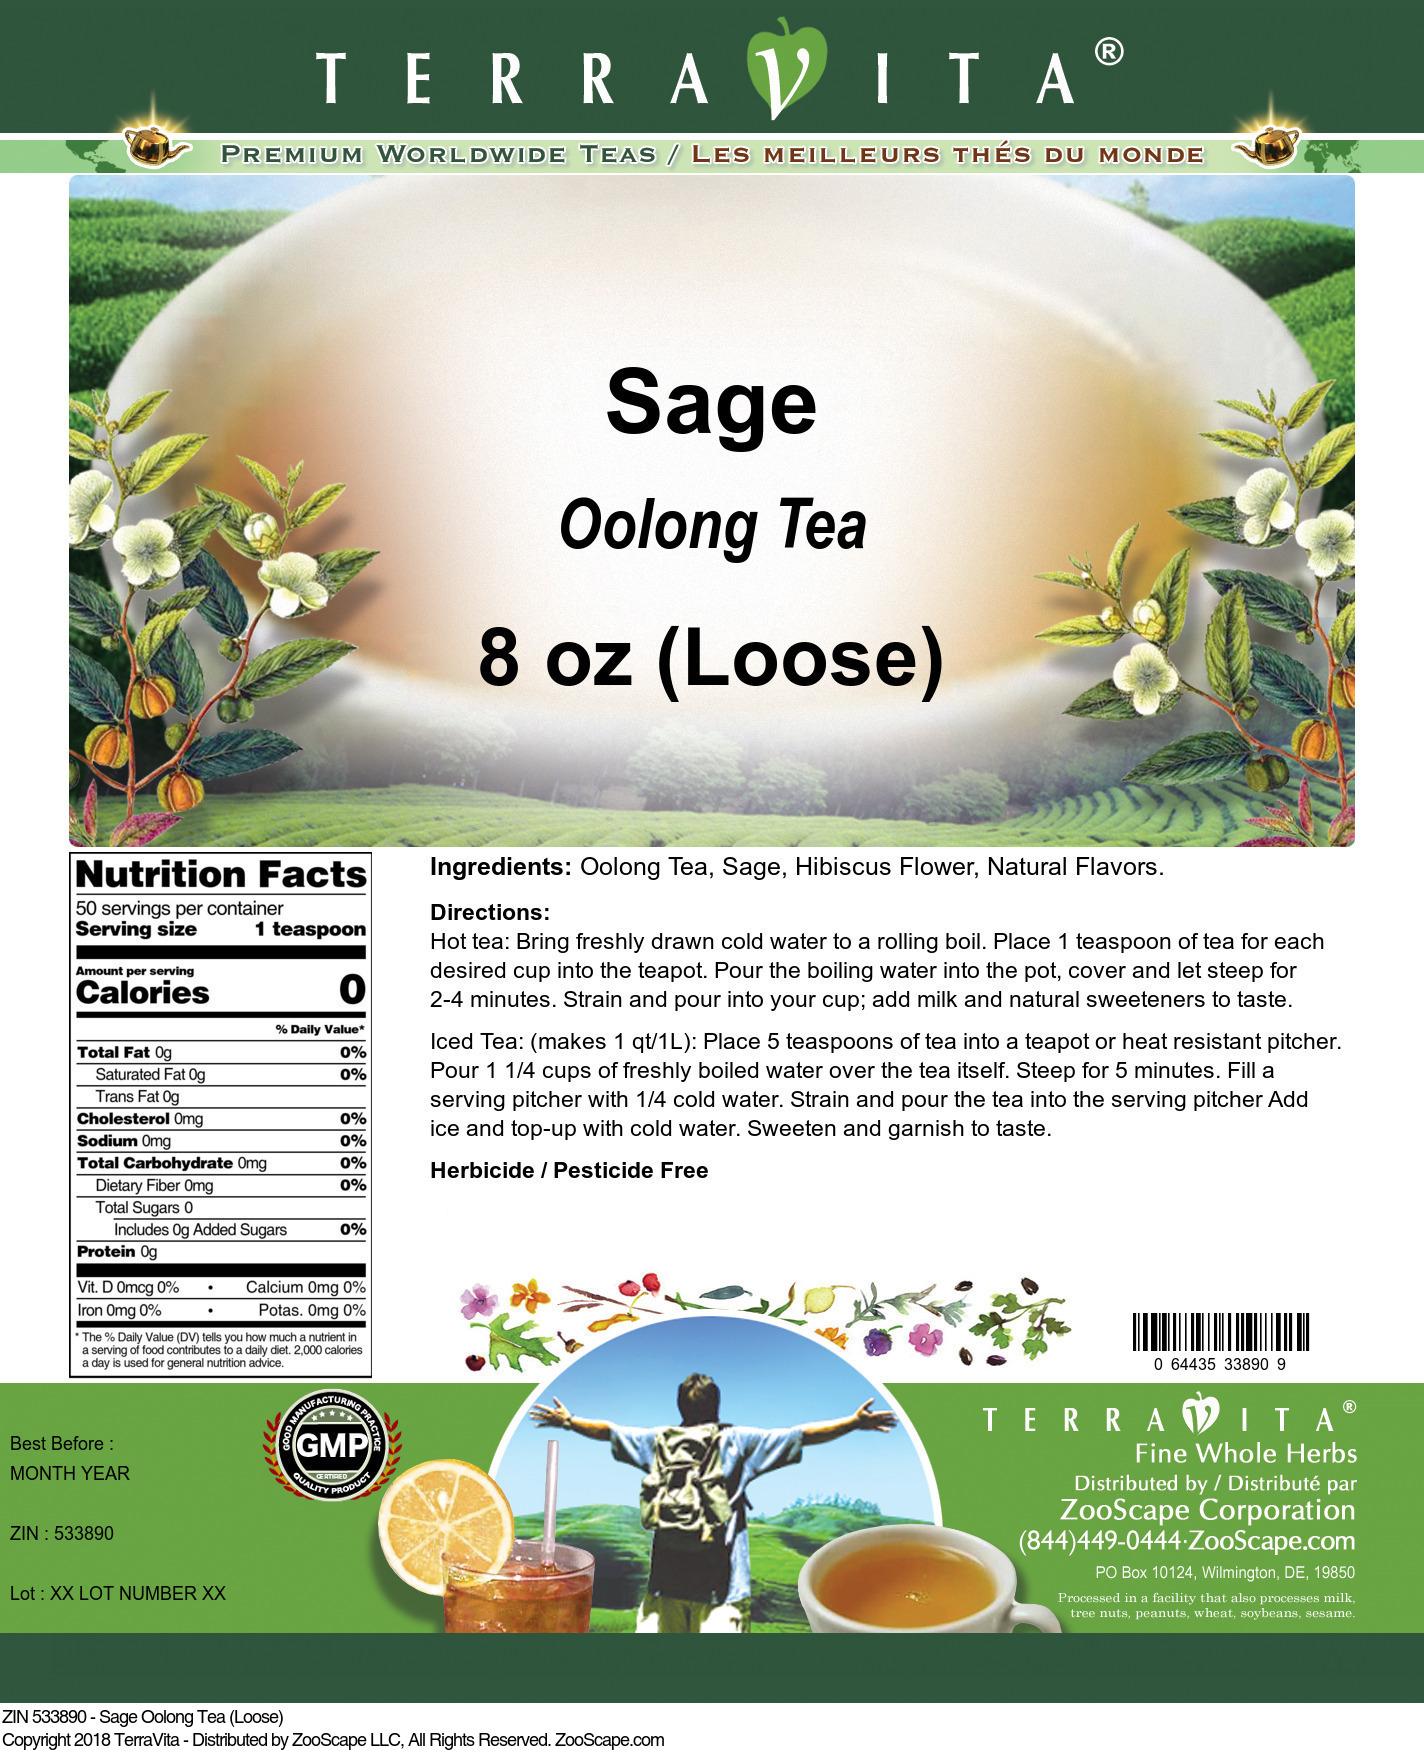 Sage Oolong Tea (Loose)